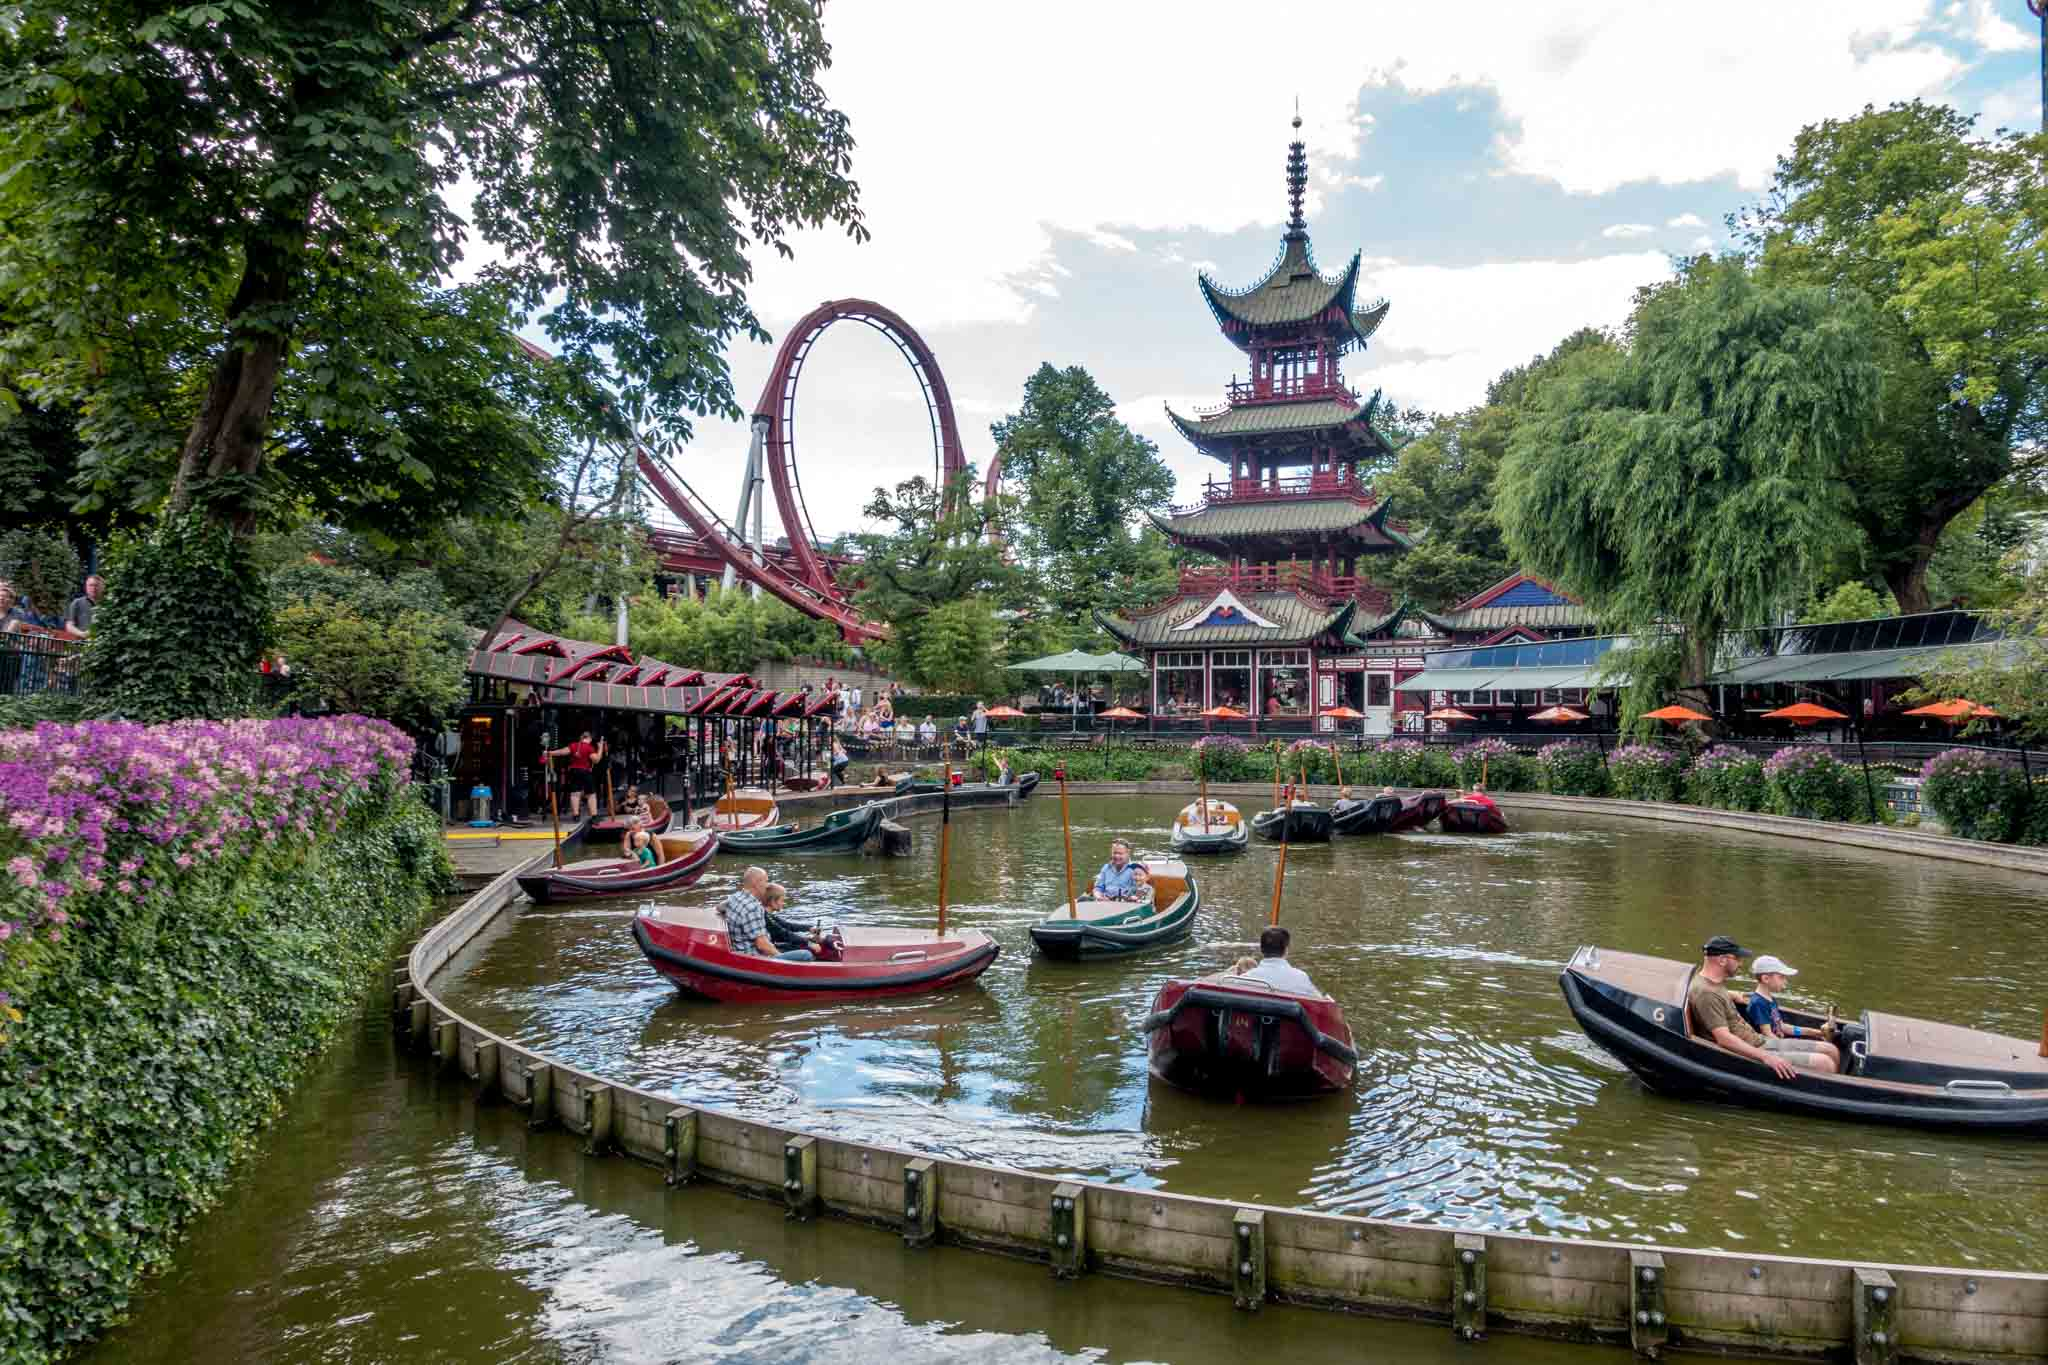 Boat ride at Tivoli Gardens, the Copenhagen amusement park